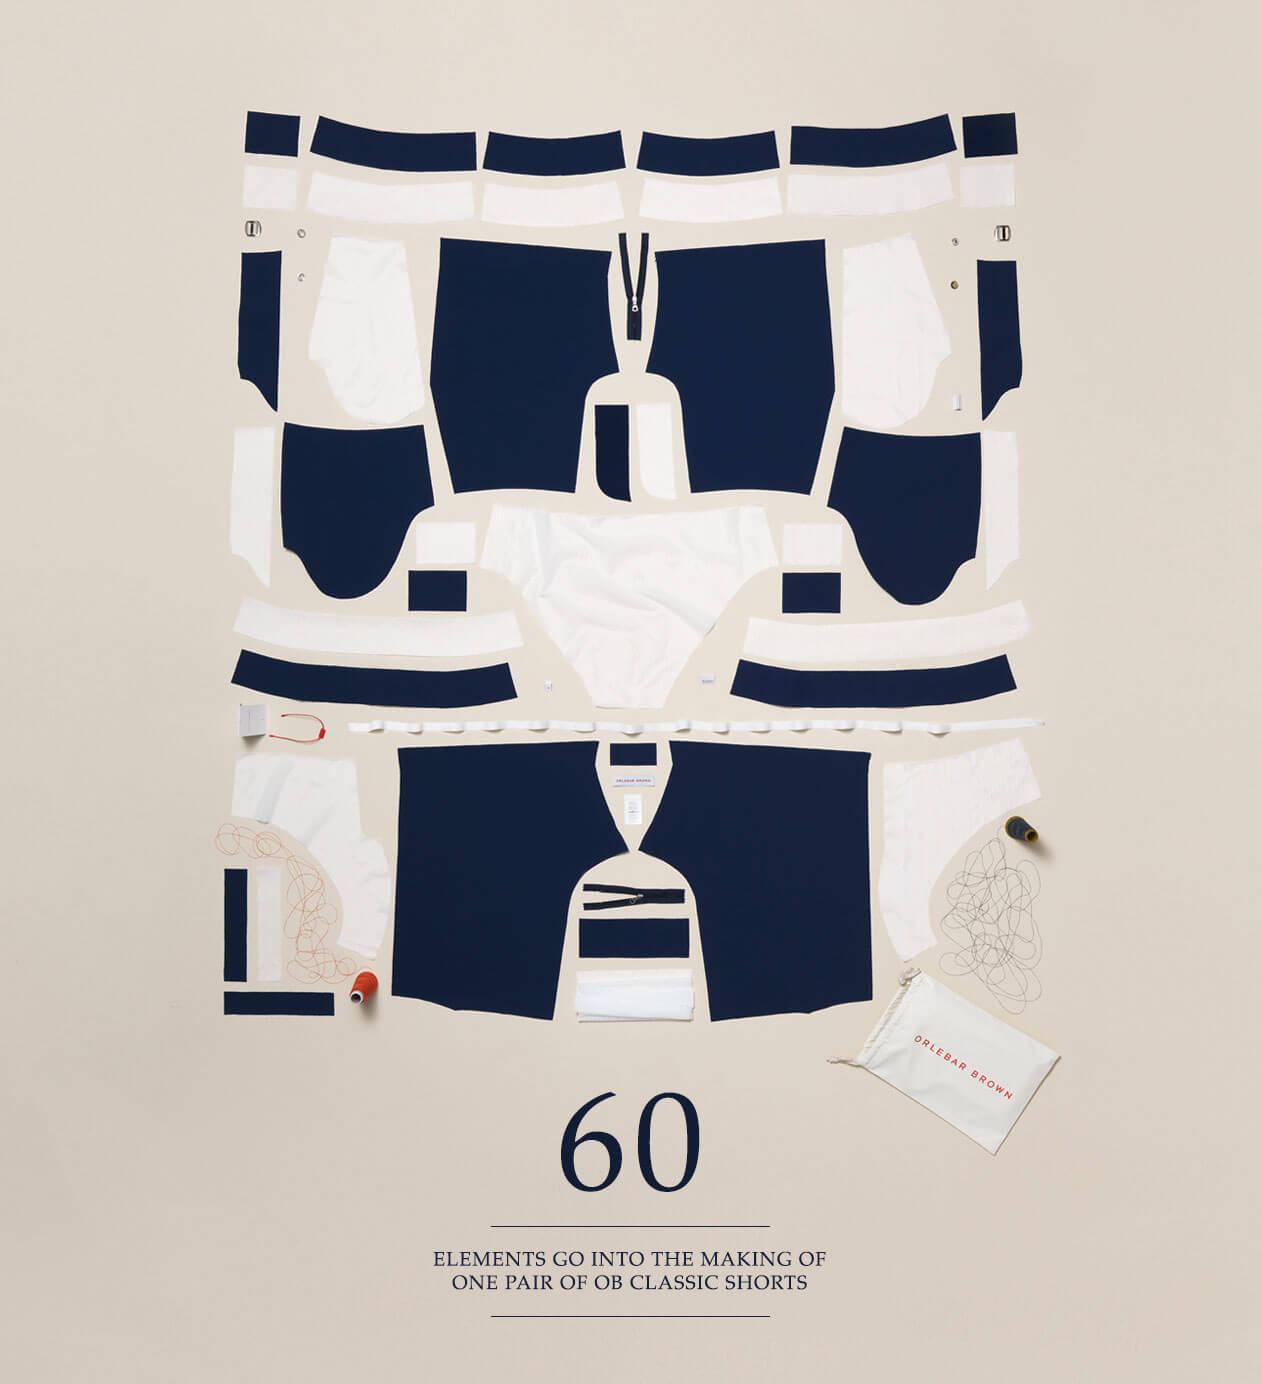 der traditionell geschnittene Hosenblock